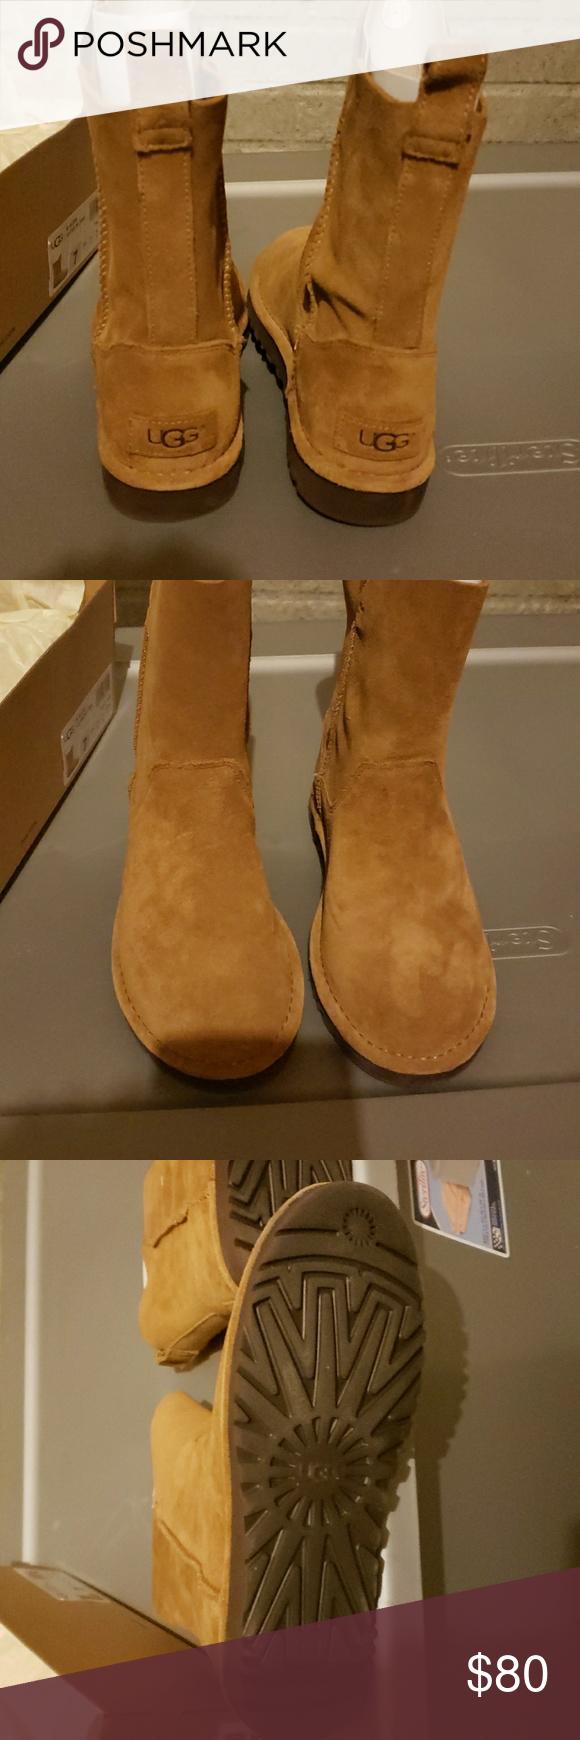 52a958111a8 NIB Unlined UGG Alida boots New, never been worn, Alida UGG boots ...